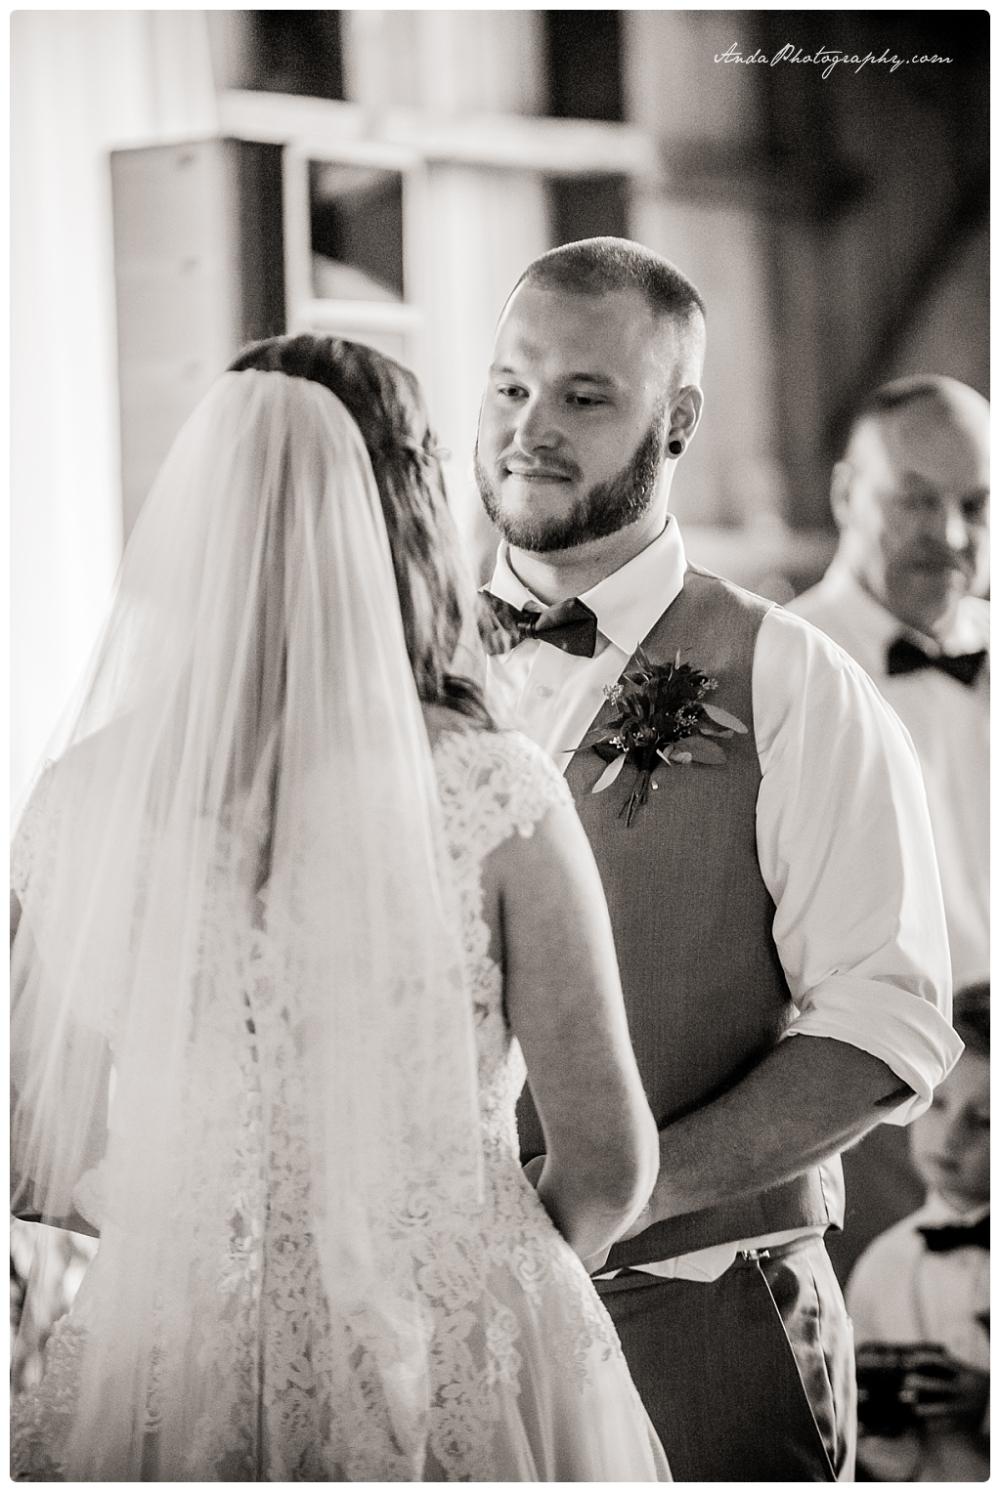 Anda Photography Bellingham wedding photography Bellingham lifestyle wedding photographer Maplehurst Farms_0059